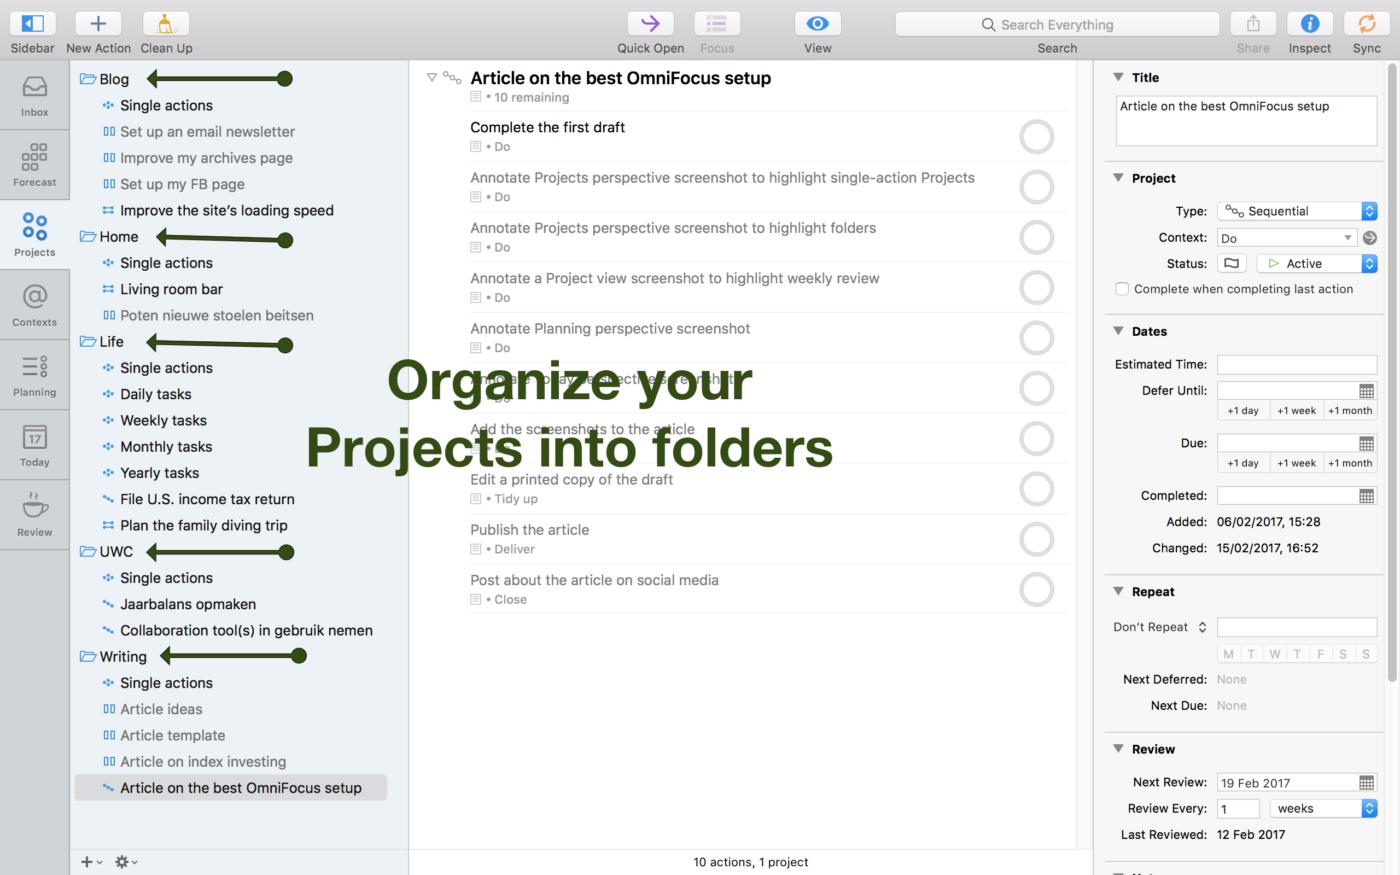 Screenshot of my Projects organized into folders.